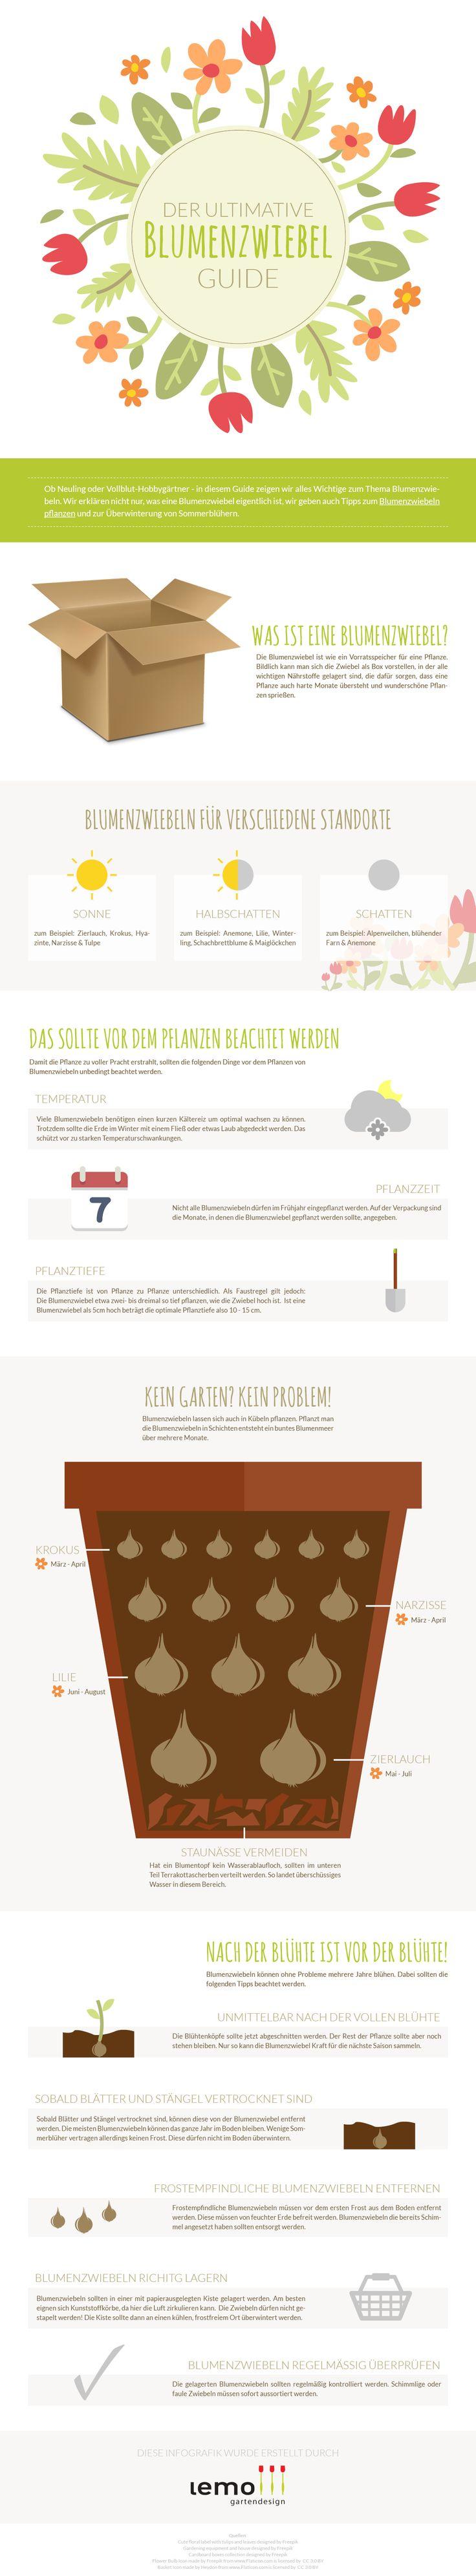 Infografik: Blumenzwiebeln pflanzen - Der ultimative Guide